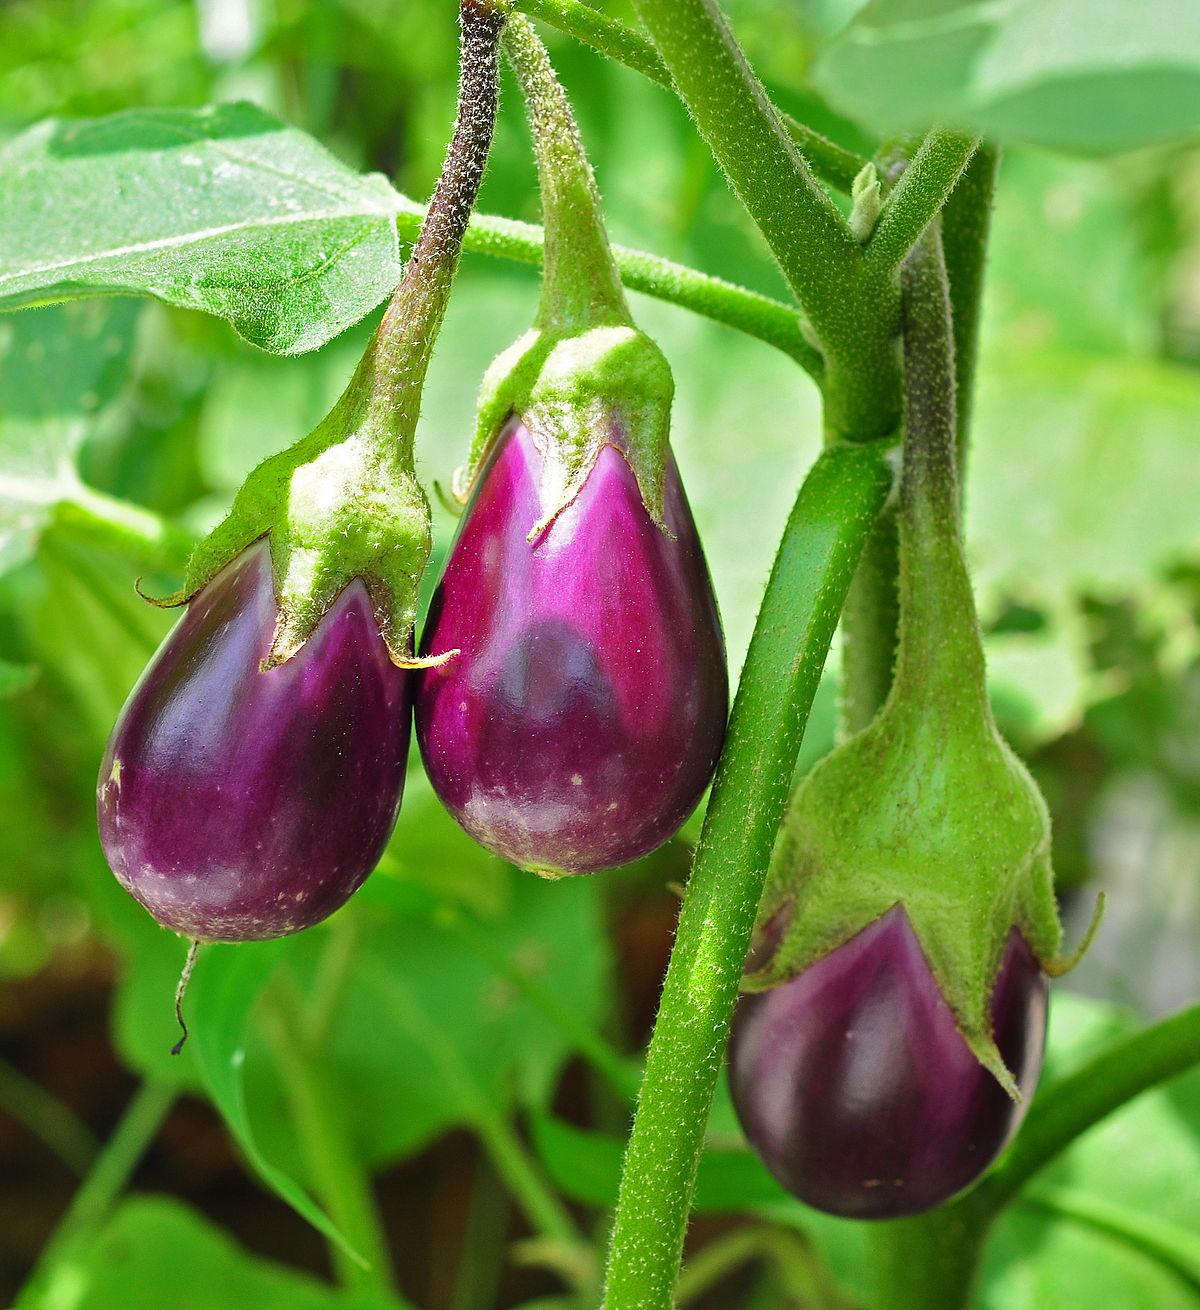 Plant Guide: Eggplant| Growing Eggplant, Growing Eggplant From Seed, Vegetable Gardening, Vegetable Gardening for Beginners, Vegetable Garden, Garden Ideas, Gardening